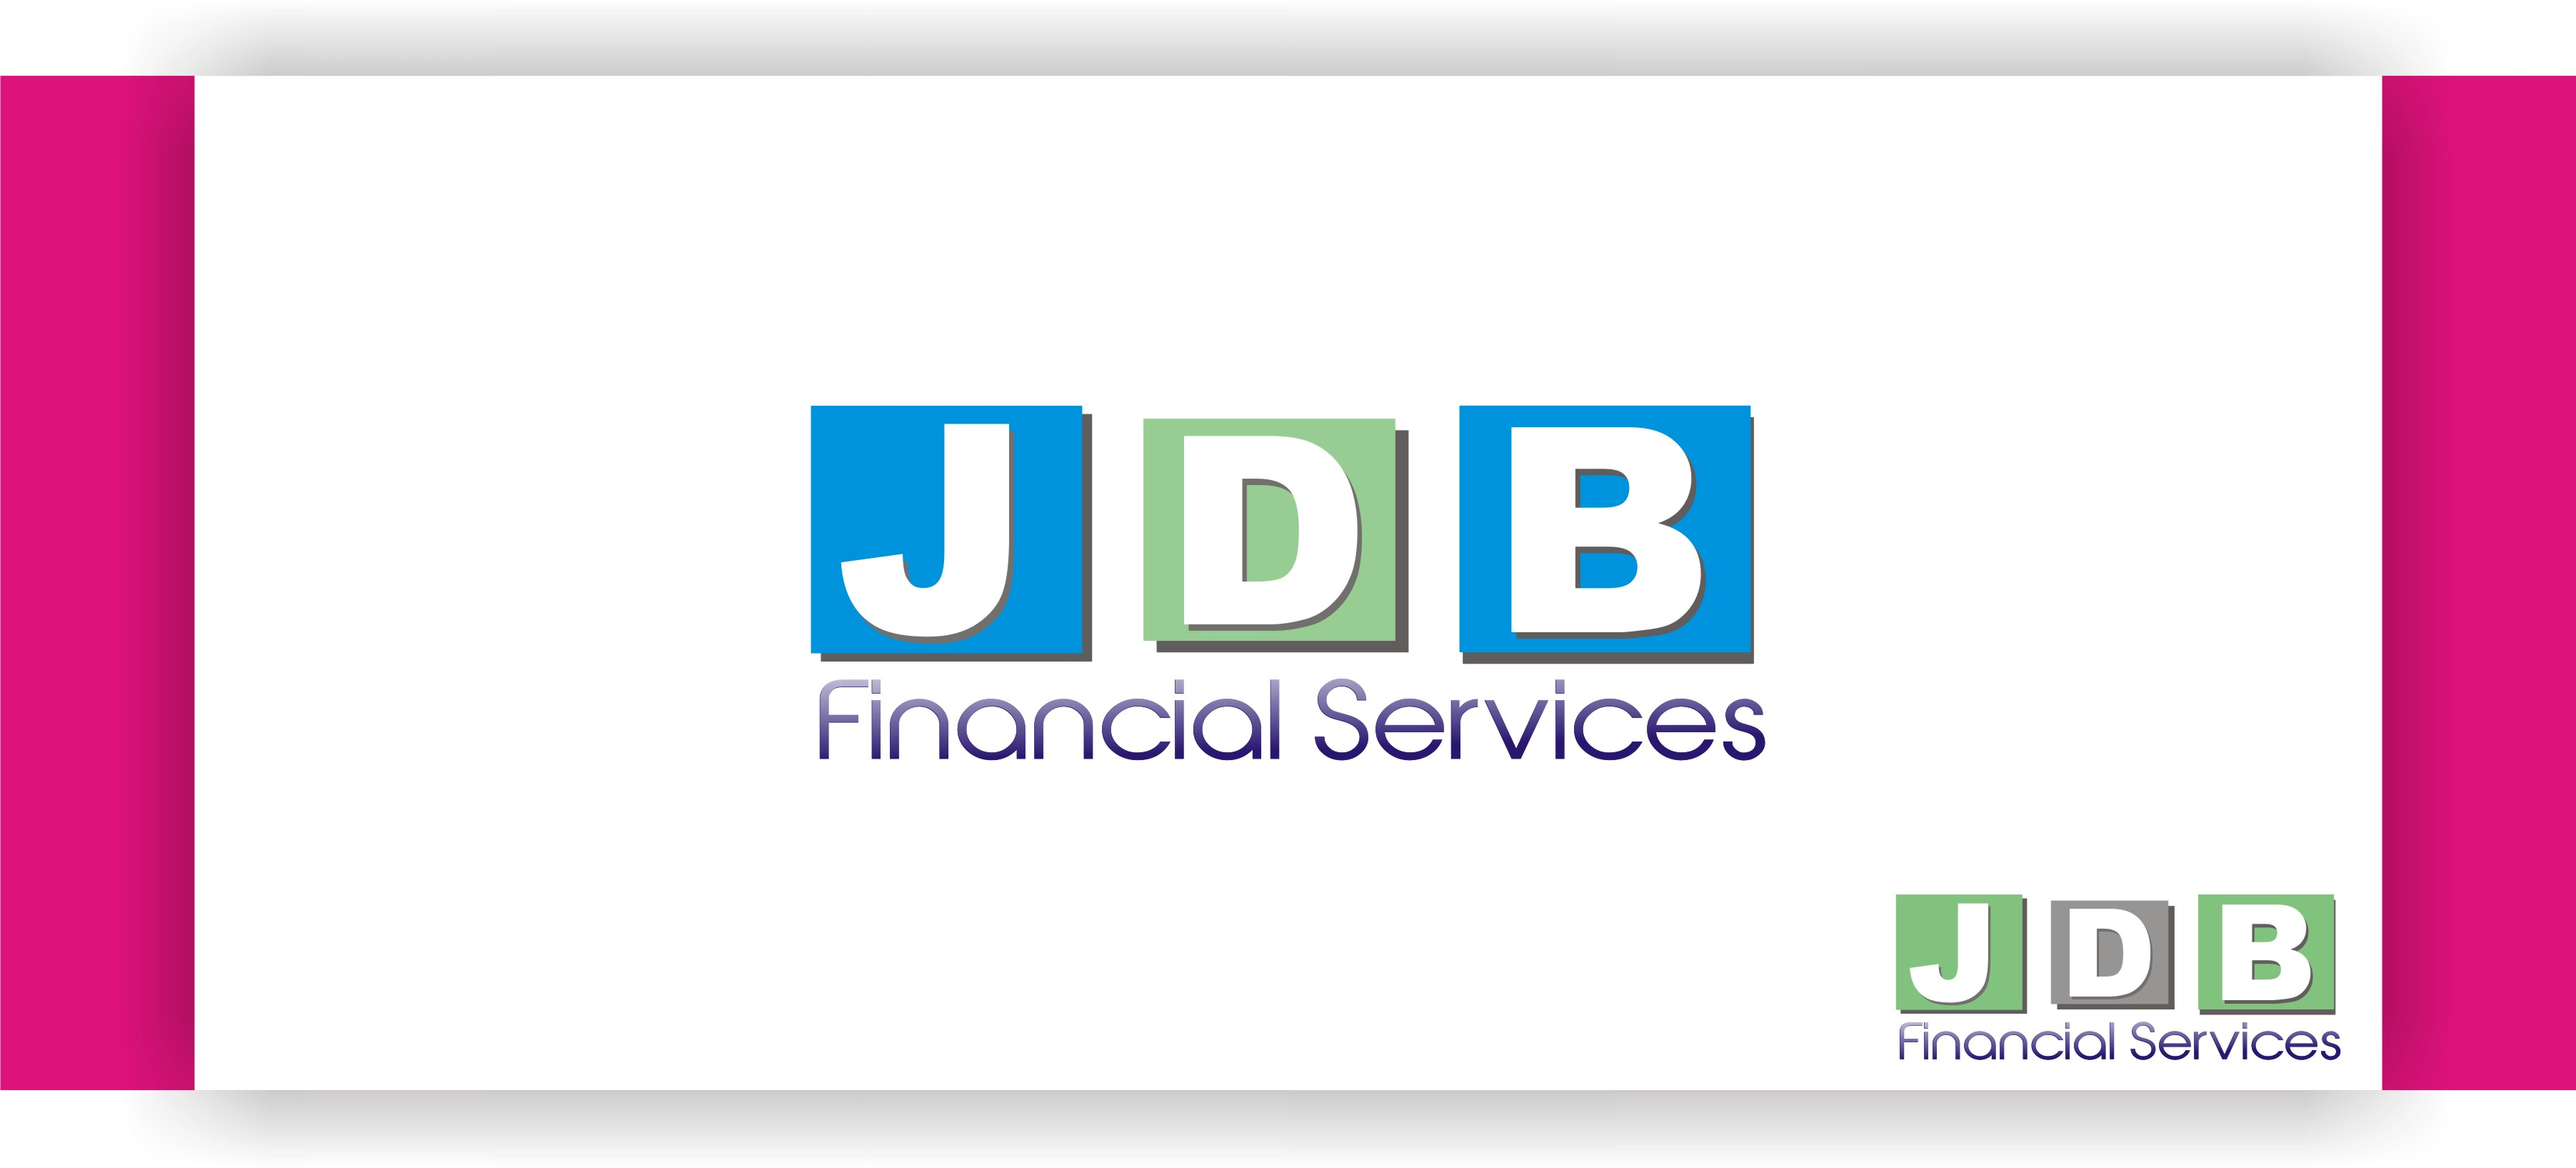 Logo Design by Shailender Kumar - Entry No. 11 in the Logo Design Contest Unique Logo Design Wanted for JDB Financial Services.